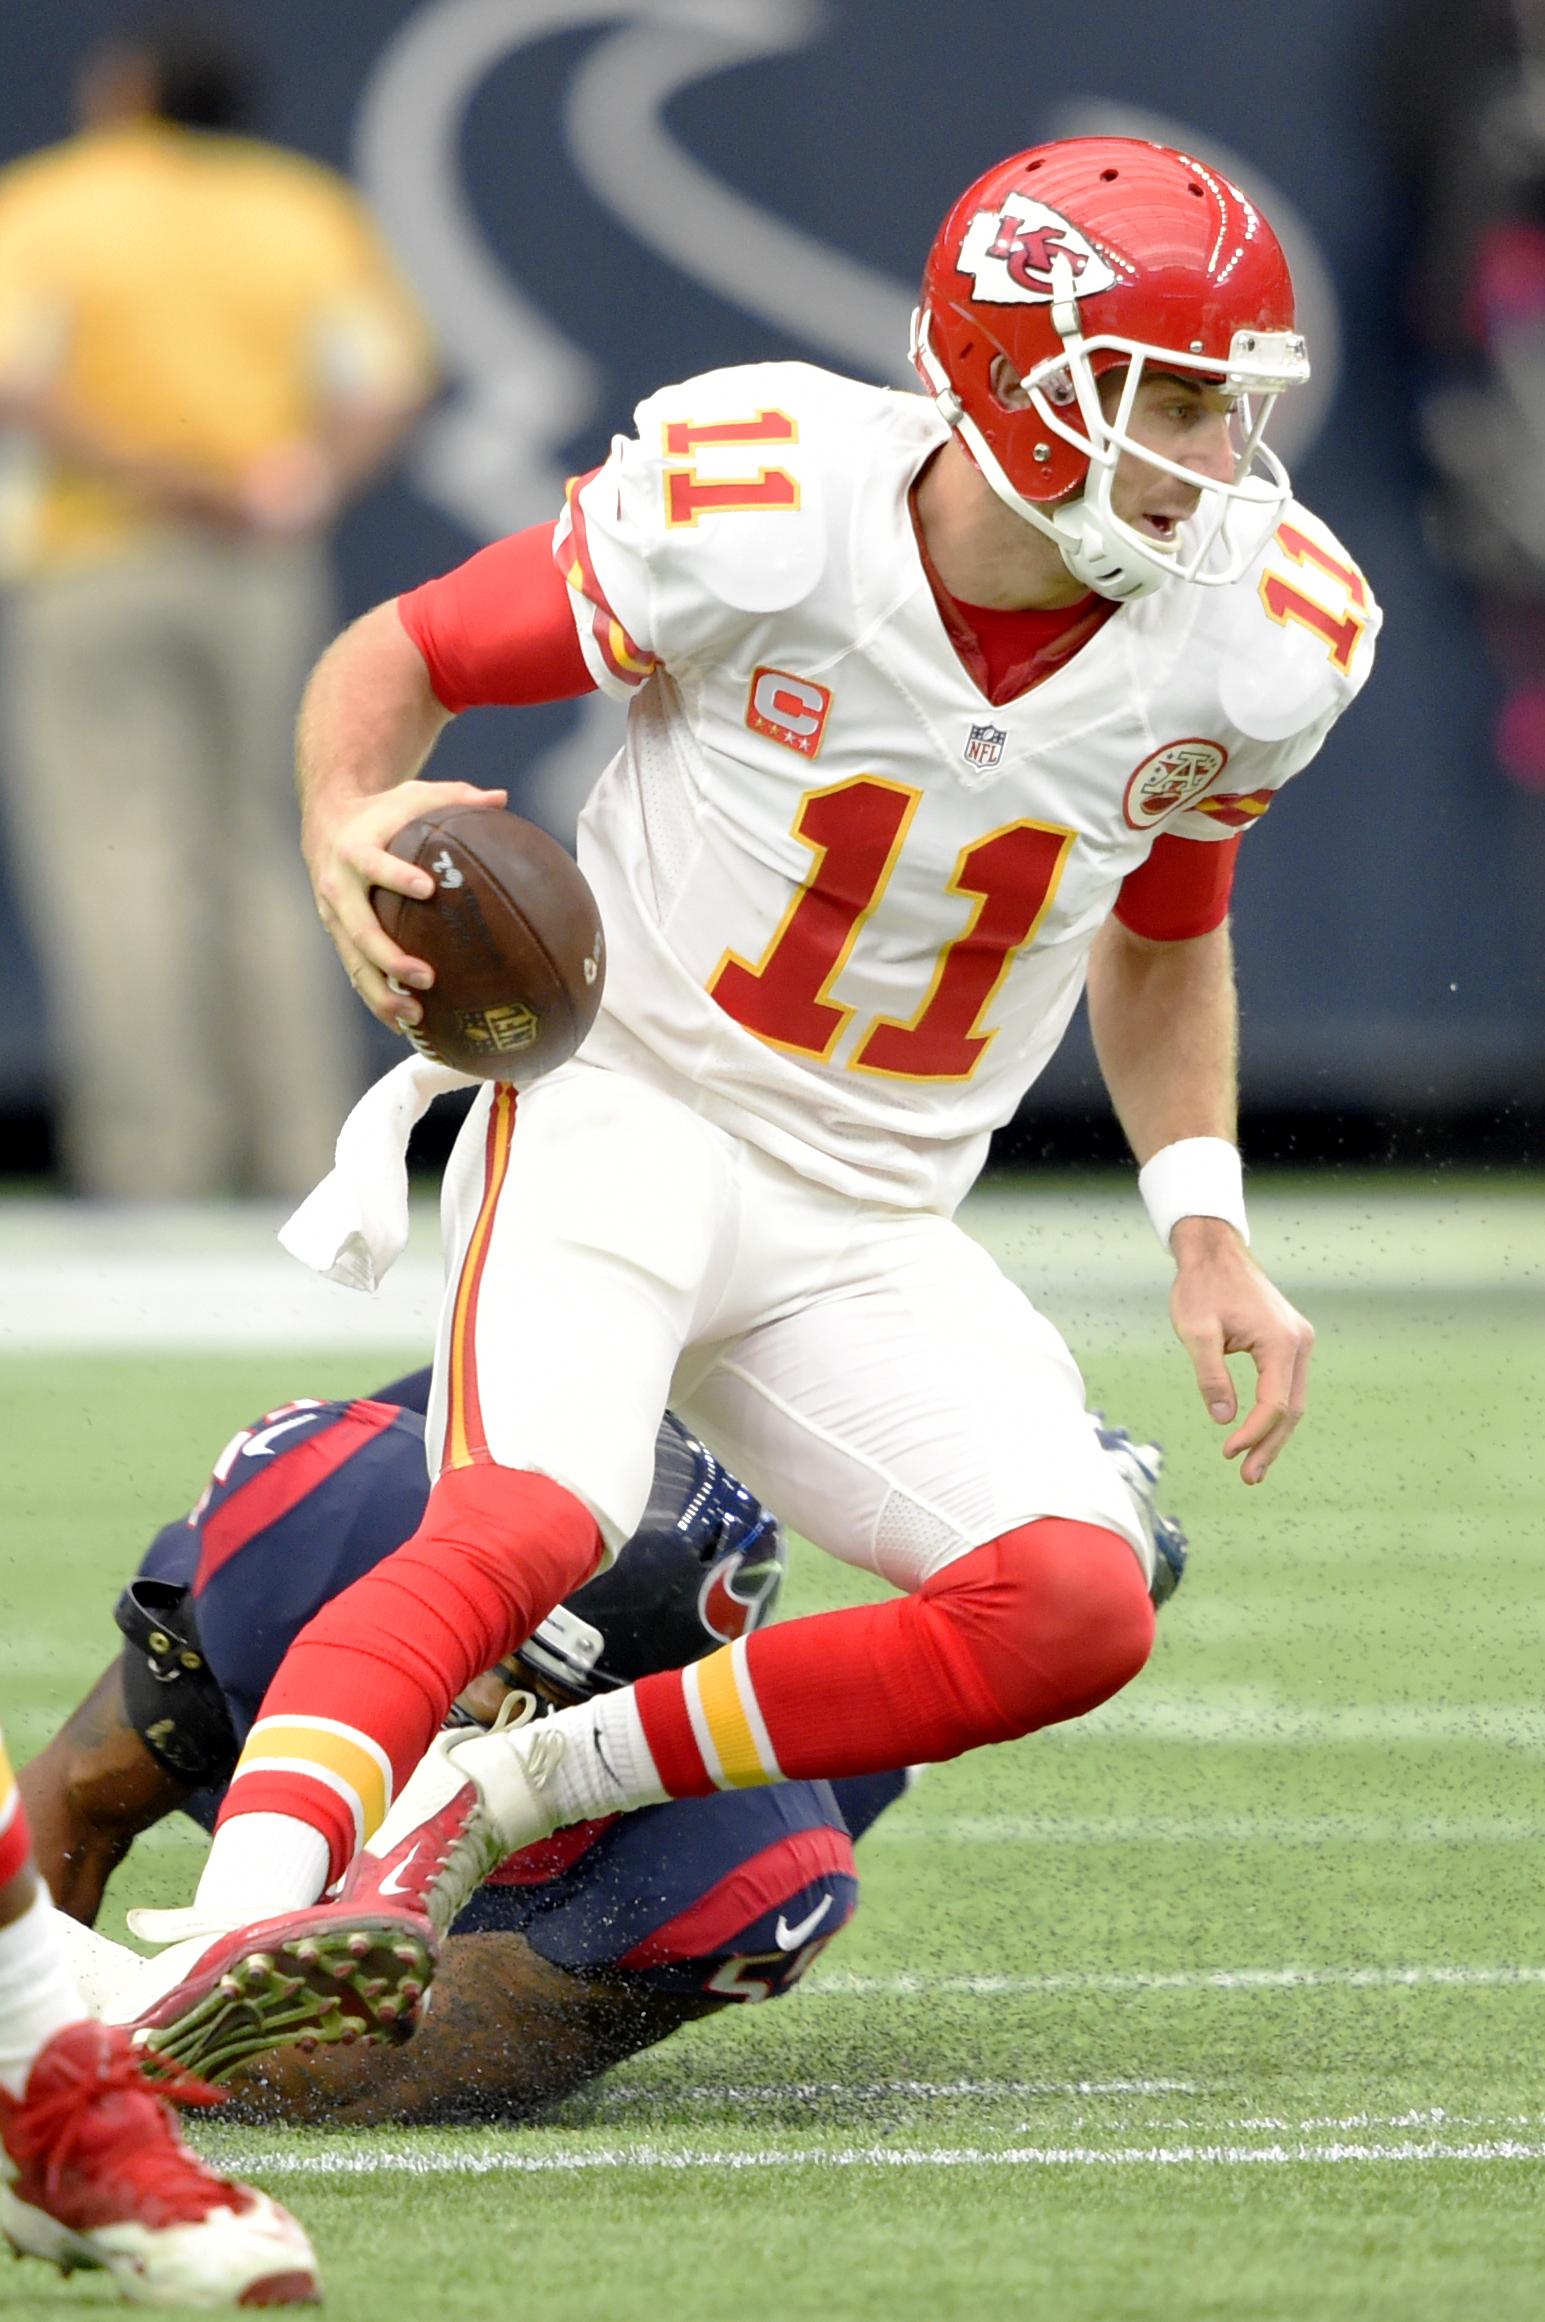 Chiefs vs. Patriots, NFL playoff odds 2016: Kansas City betting underdog at New England